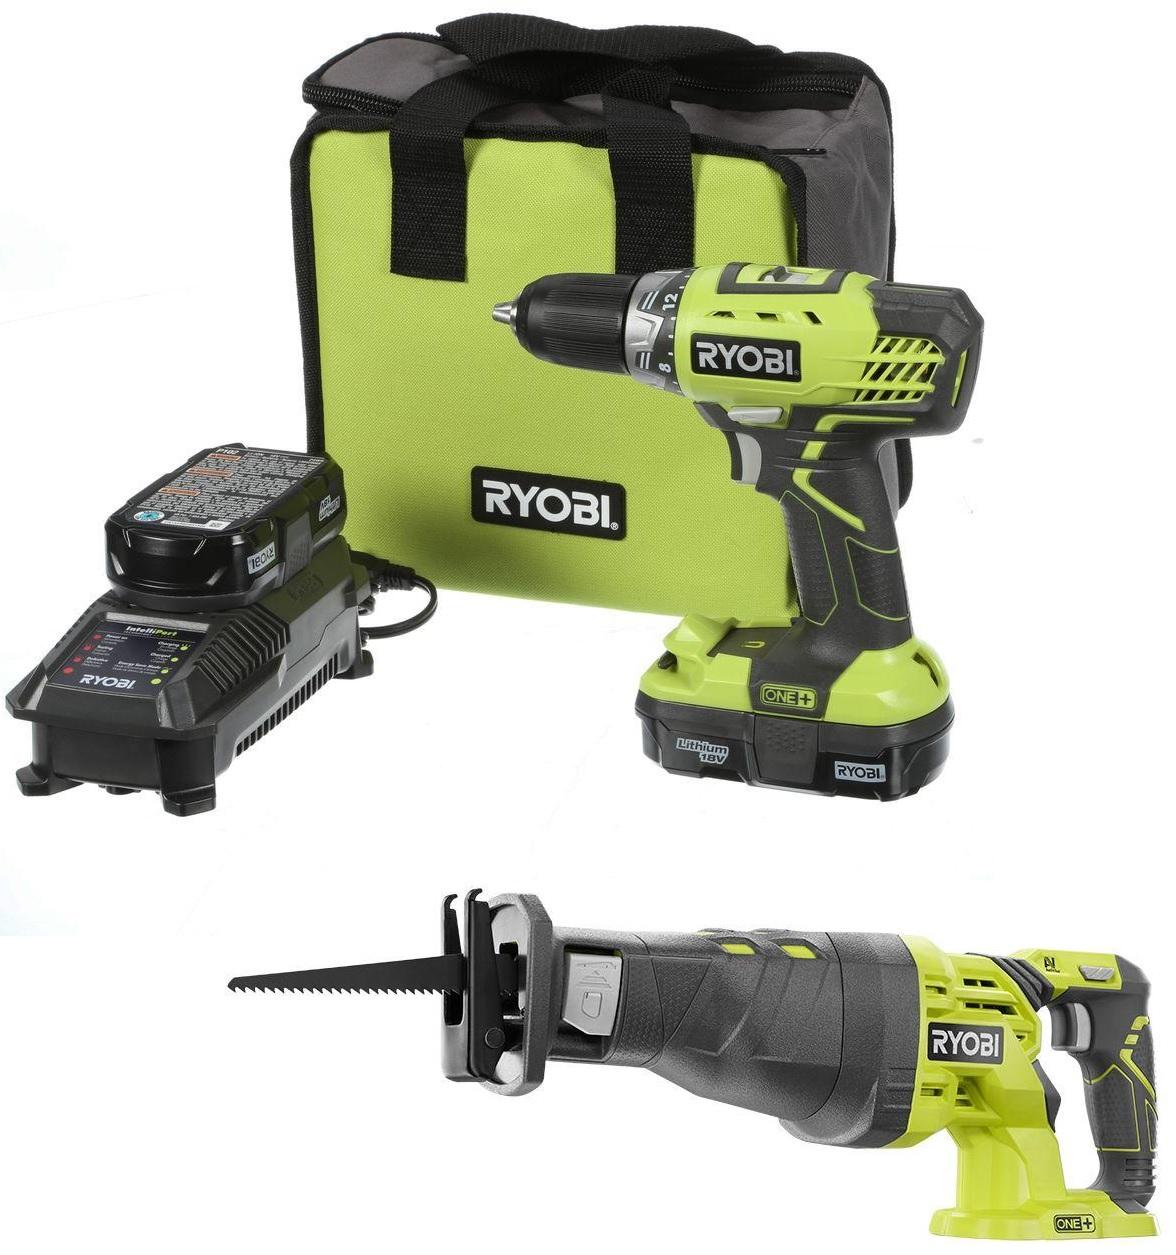 Ryobi ONE+ Drill/Driver w/ 2 Batteries + Ryobi ONE+ Reciprocating Saw  $79 + Free Store Pickup